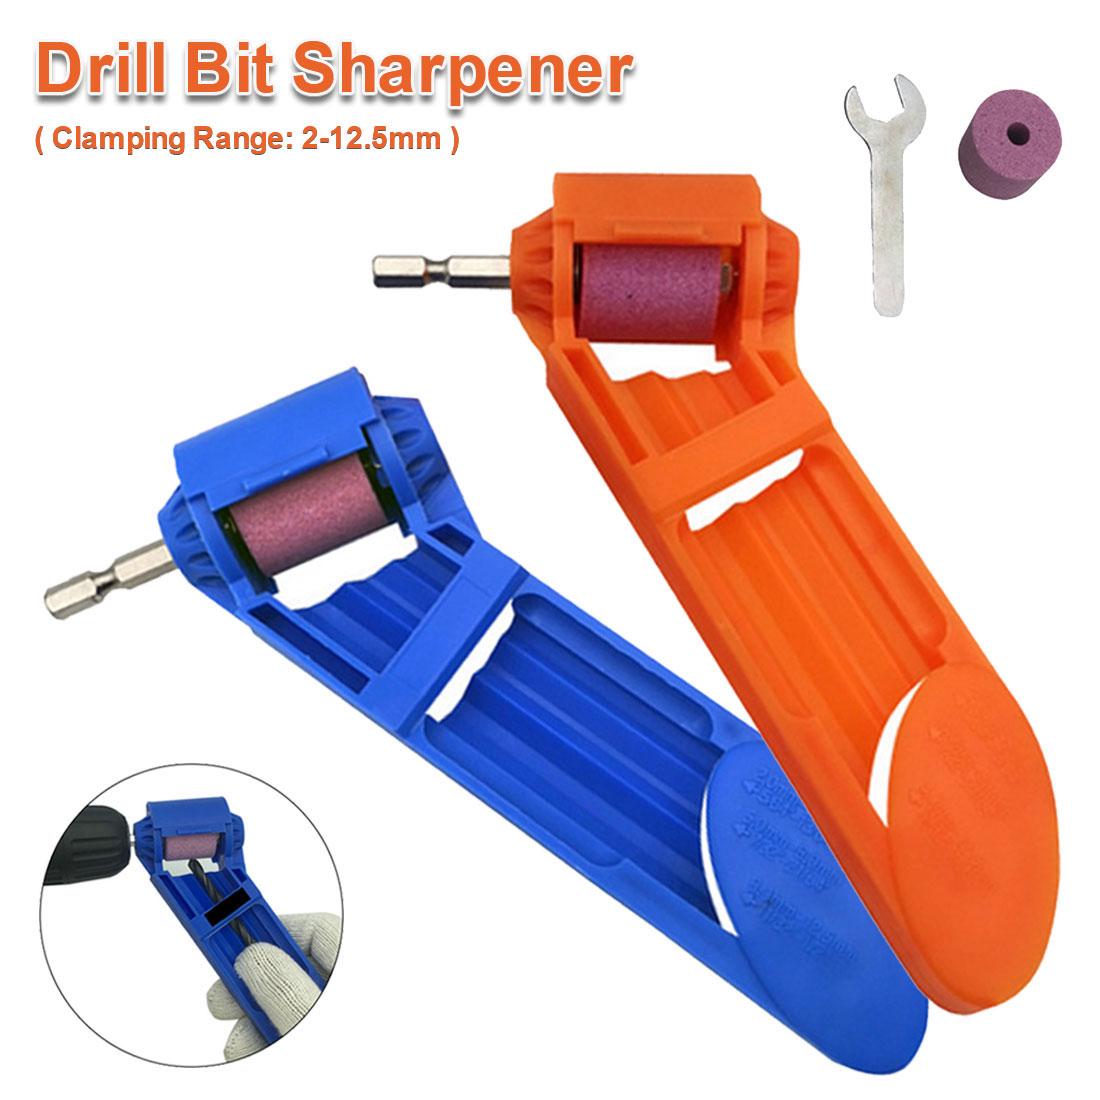 Drill Bit Sharpener Corundum Grinding Wheel Grinder Tool Drill Sharpener Power Tool For 2-12.5mm Twist Drill Edge Grinder